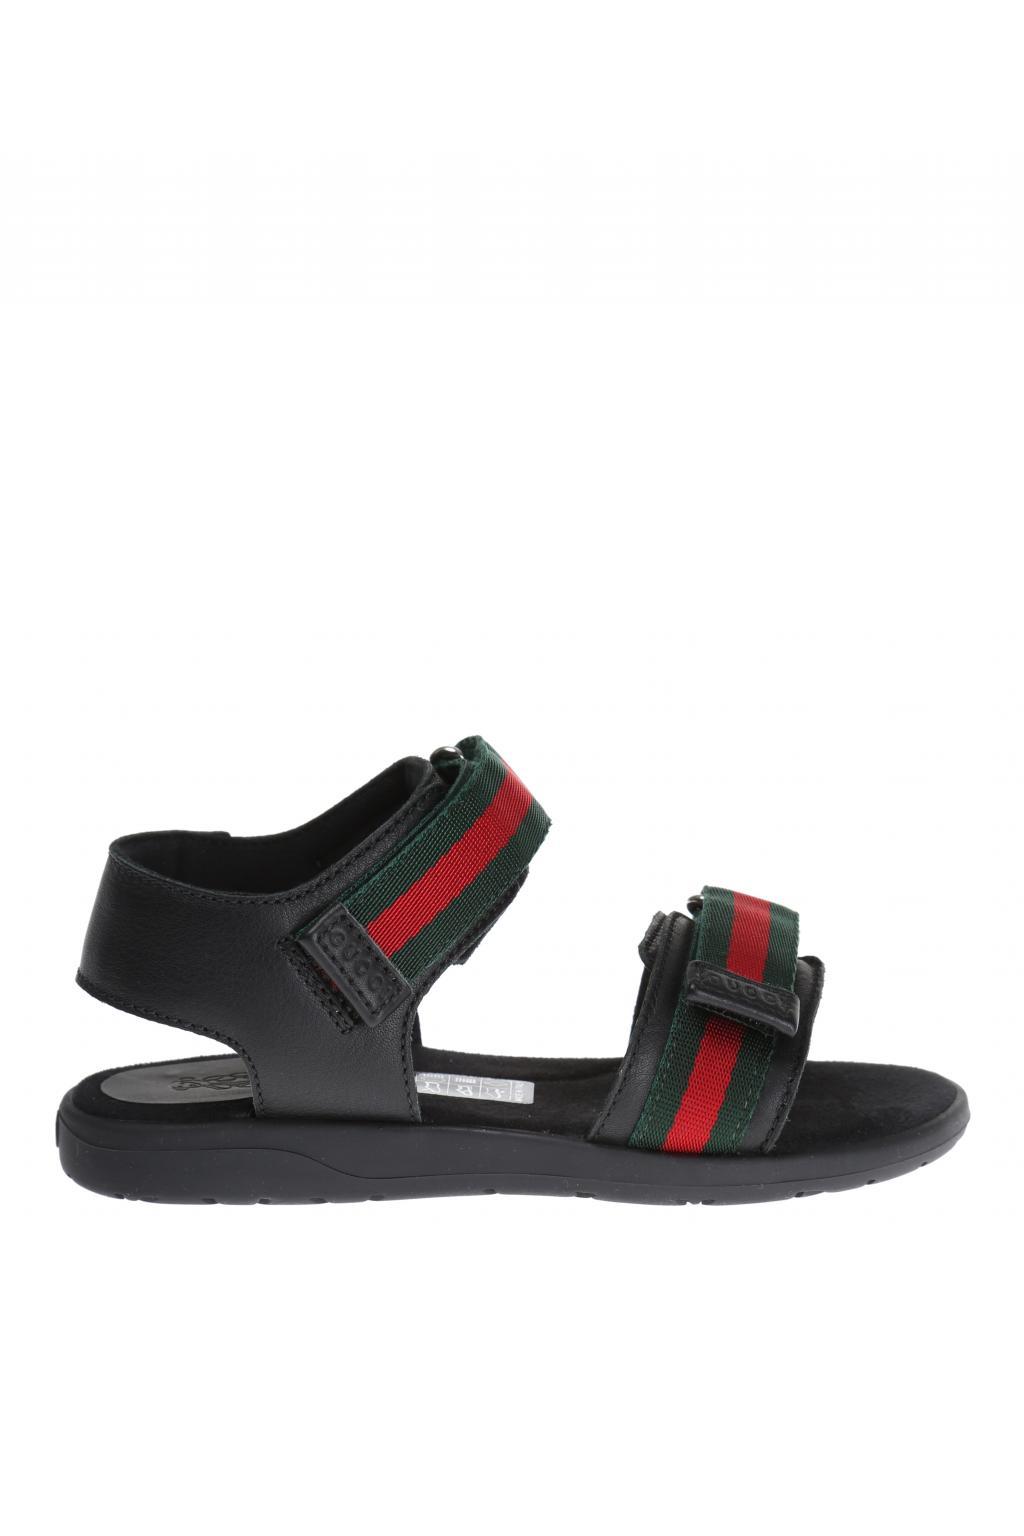 Gucci Kids Velcro Sandals